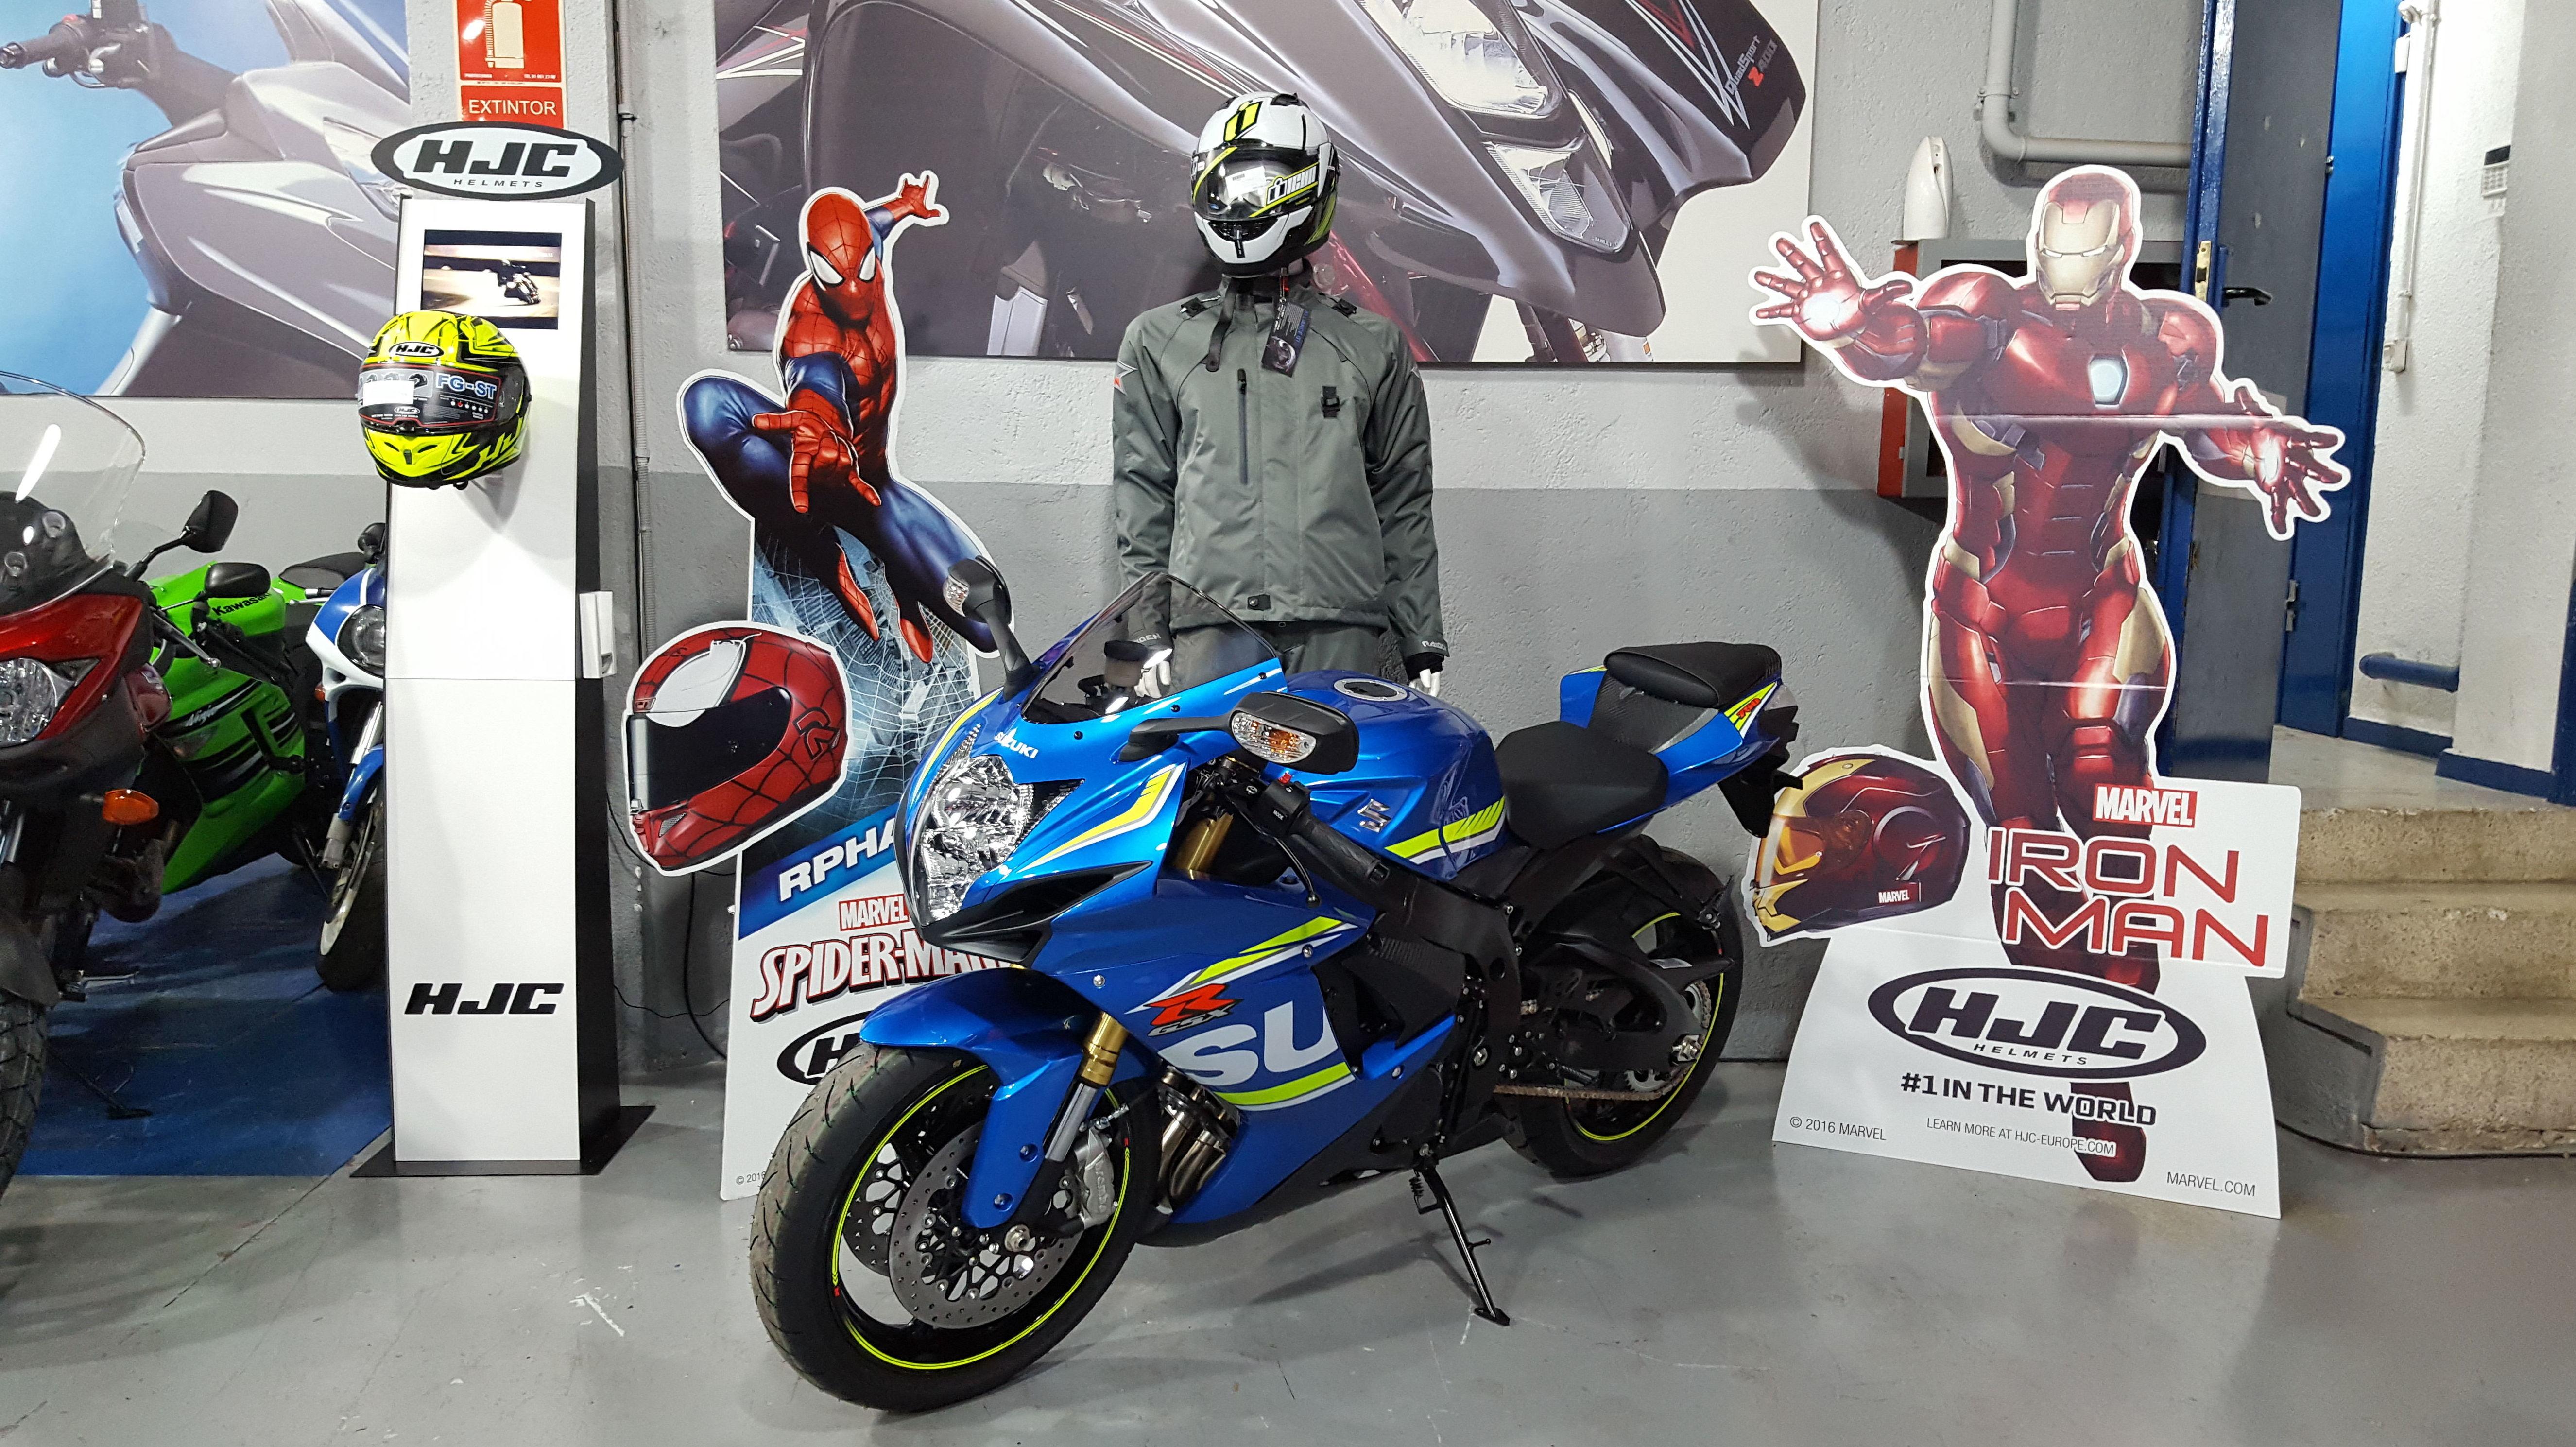 Suzuki Gsxr 750 2017 en Suzuki center, jarama motocicletas